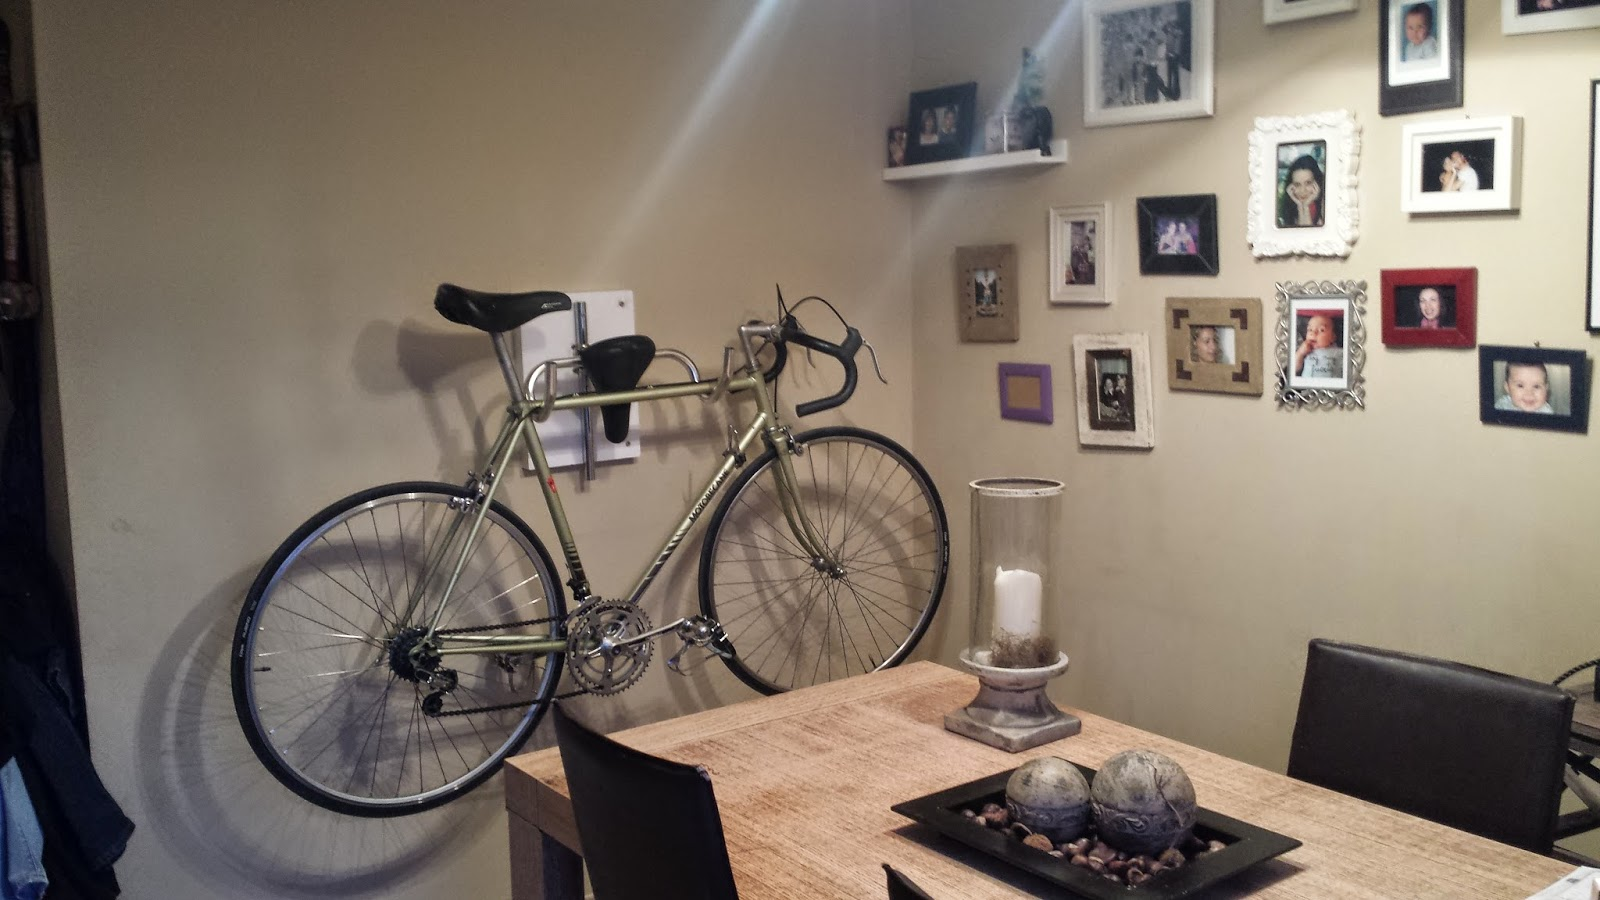 Guardar bicicletas en terraza trendy abrir imagen del for Casetas para guardar bicicletas